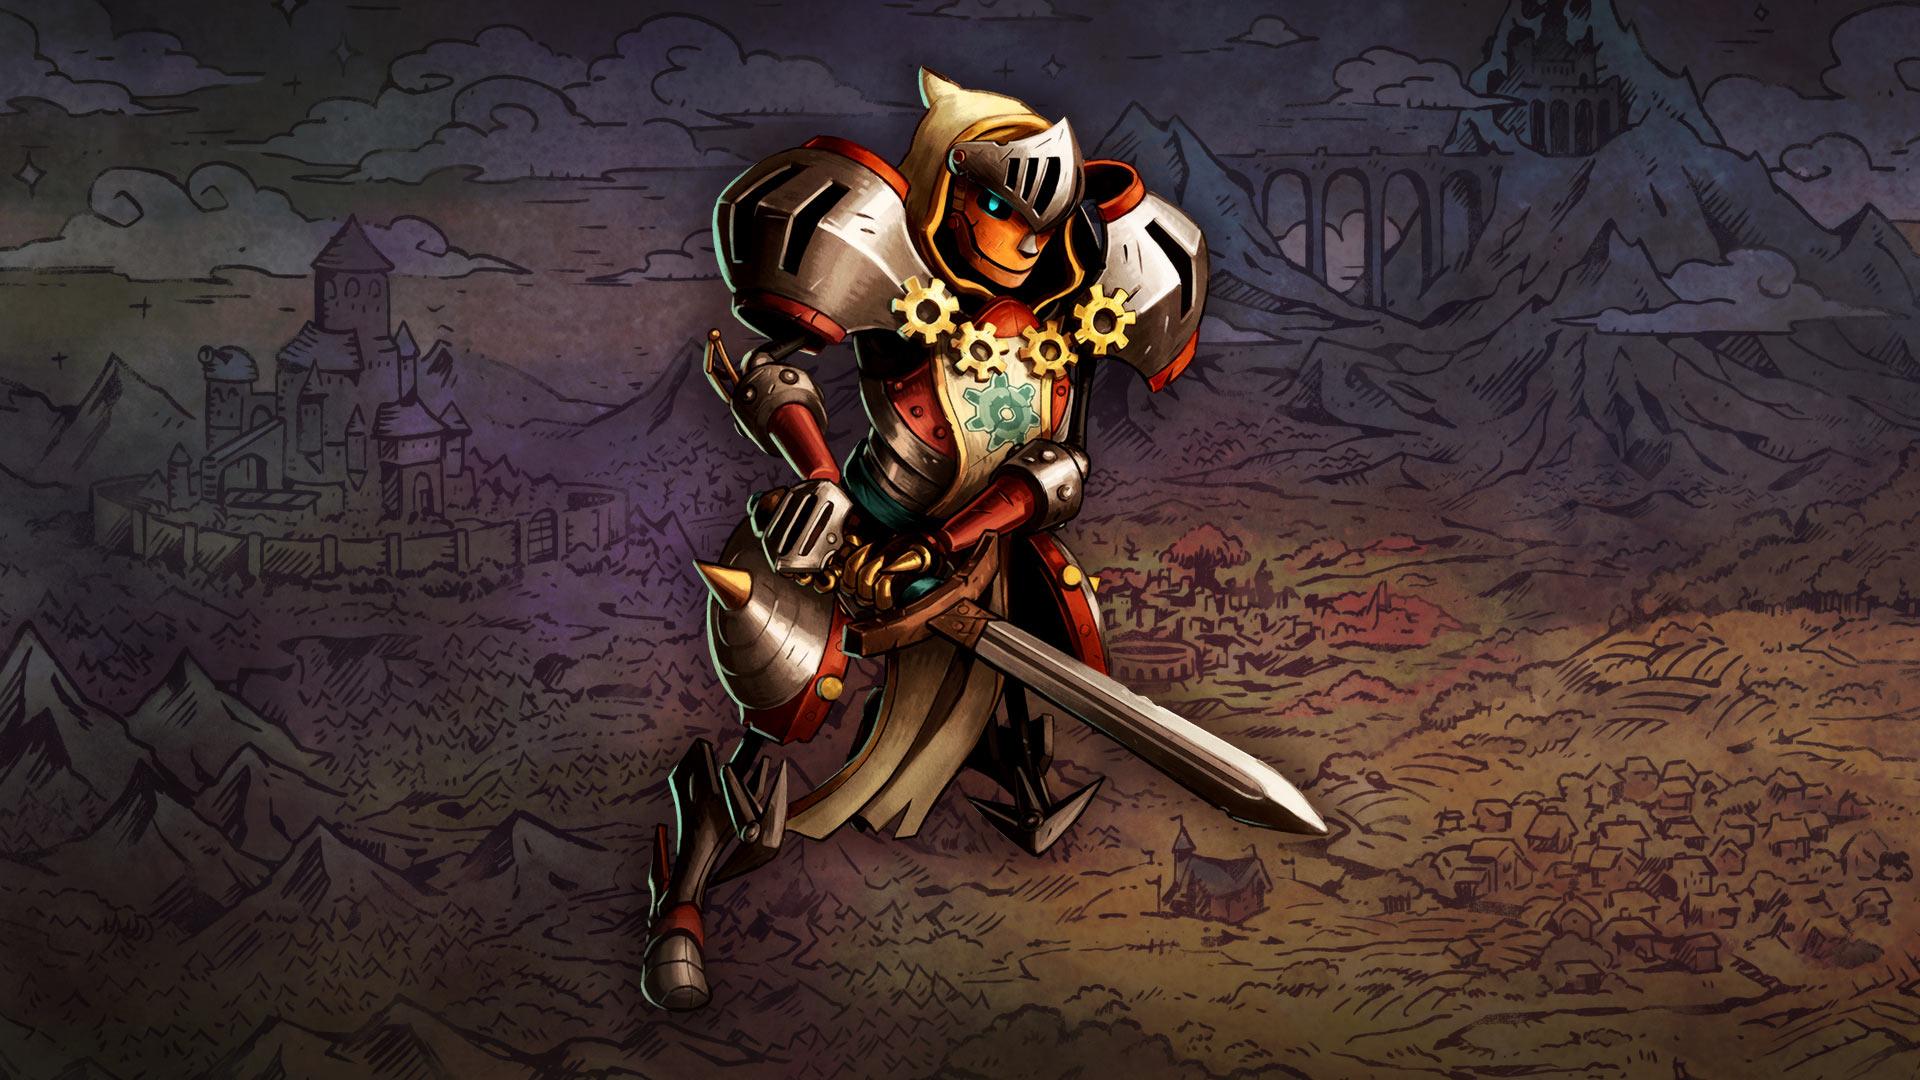 Showcase :: SteamWorld Quest: Hand of Gilgamech